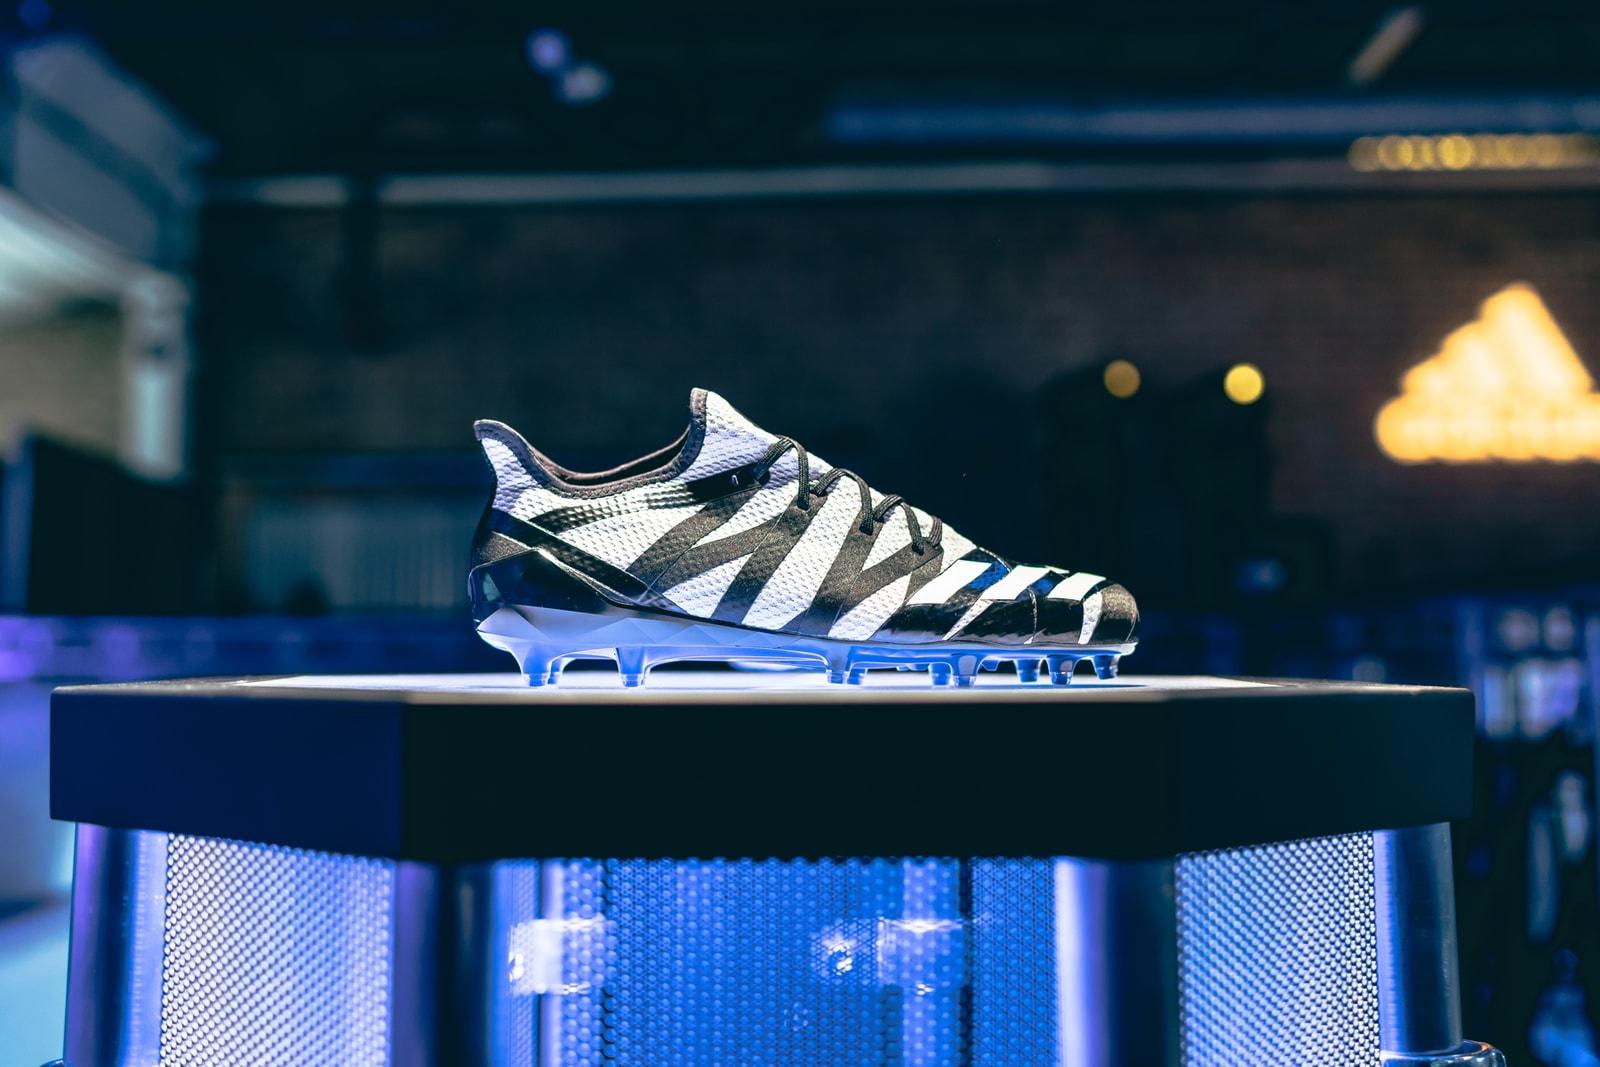 b2024ddde95 adidas SPEEDFACTORY AM4MN adidas Made for Minneapolis Football Cleat  interview Super Bowl LII pharrell williams snoop